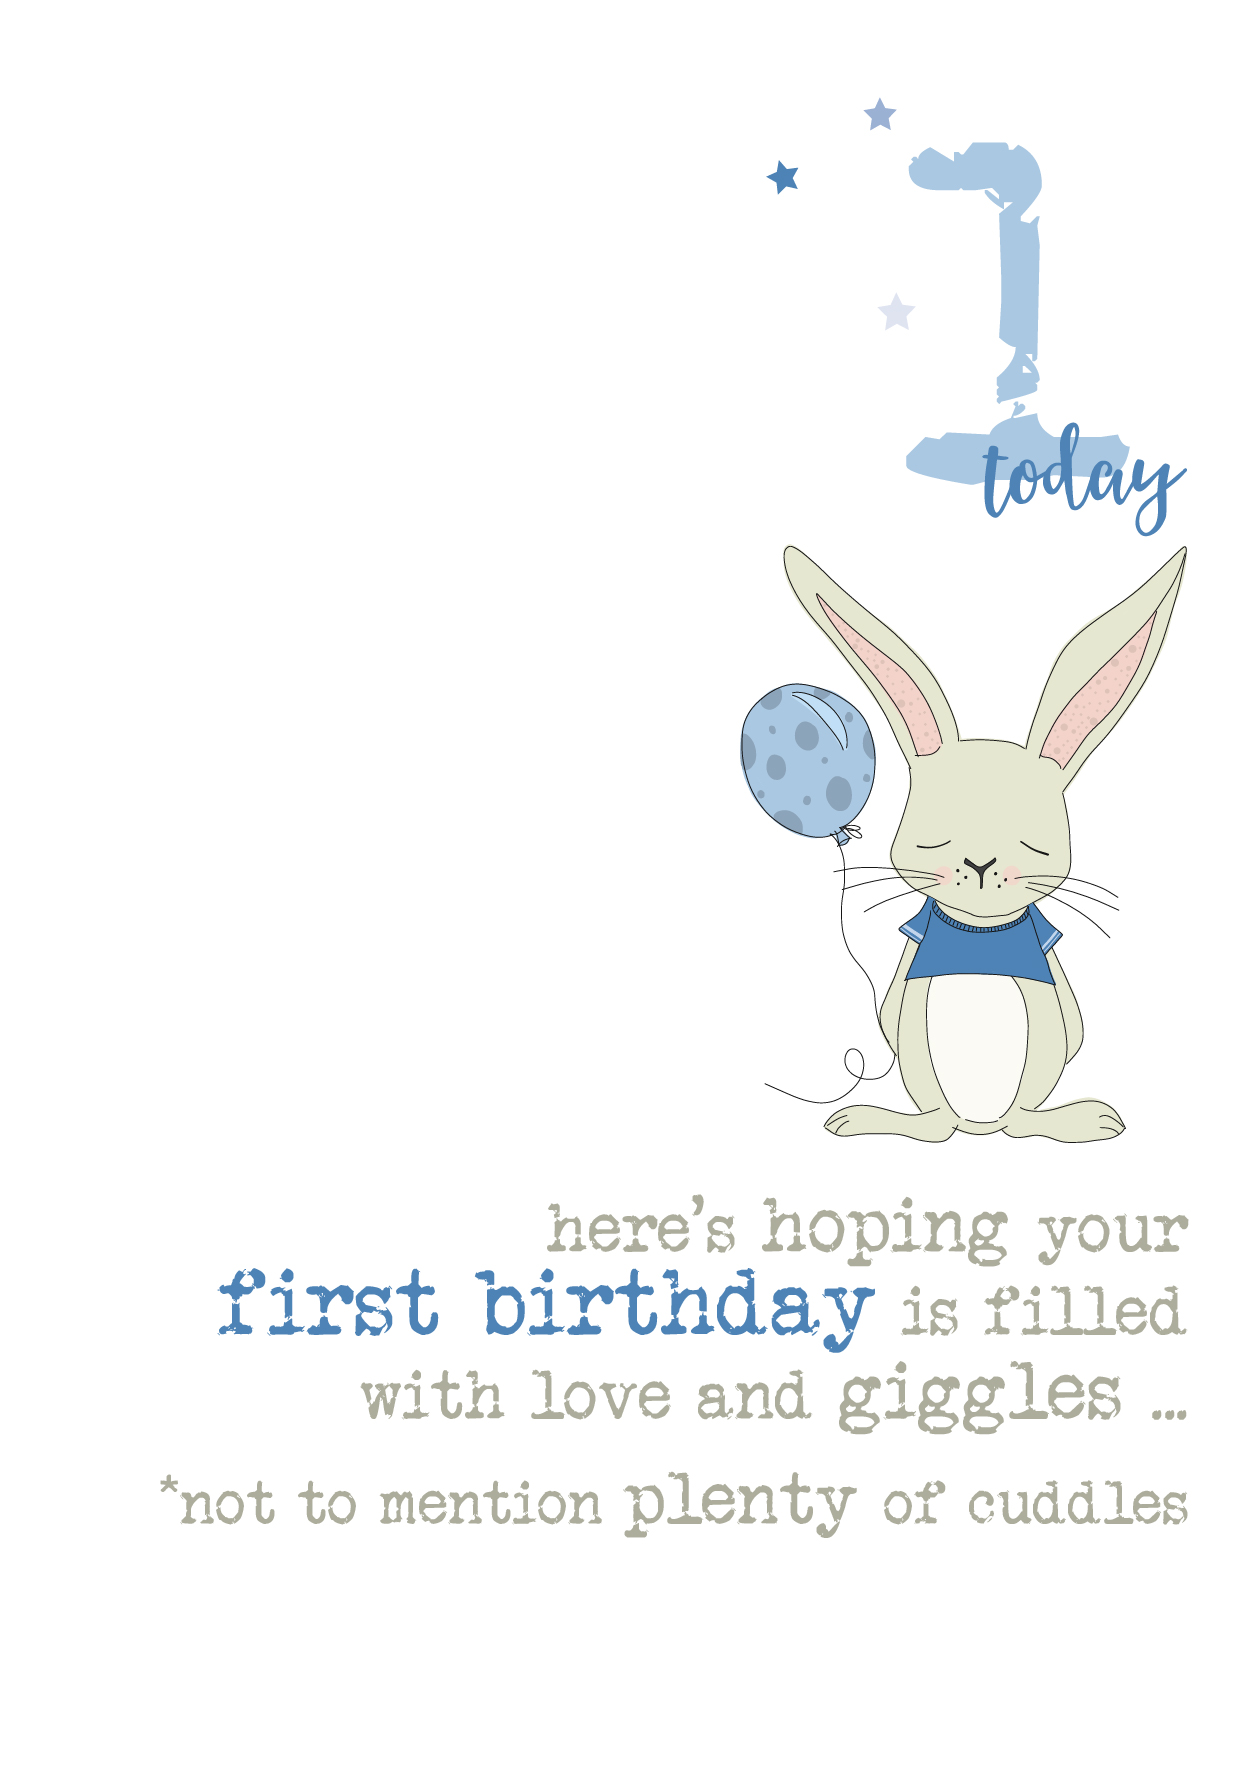 8st Birthday Boy Card - Card Design Template